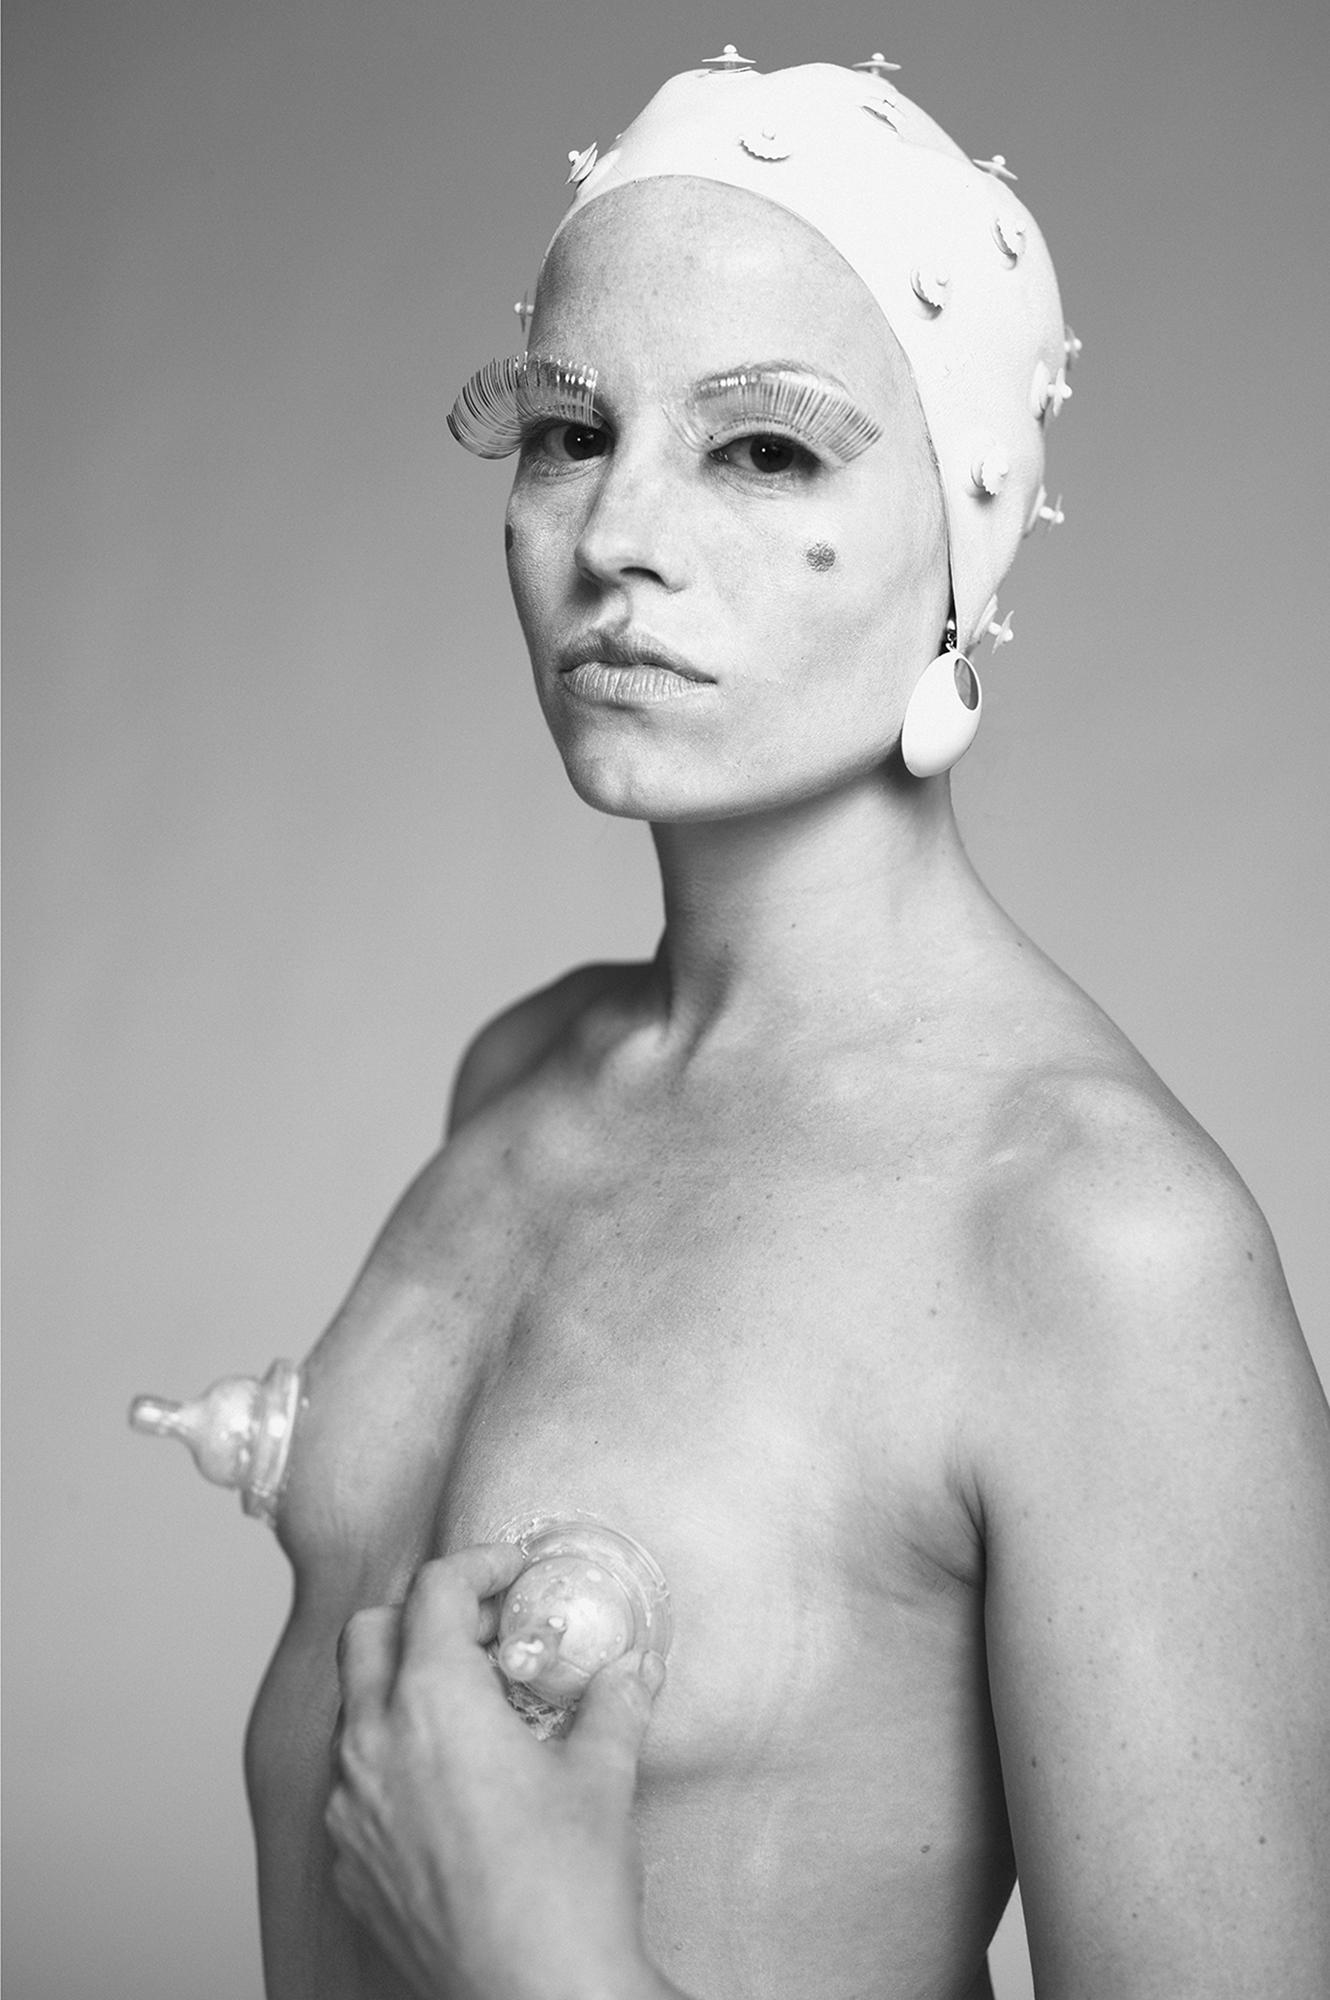 Postmodern Venus , digital photograph. Photo Credit: Chiun Kai Shih, 2012